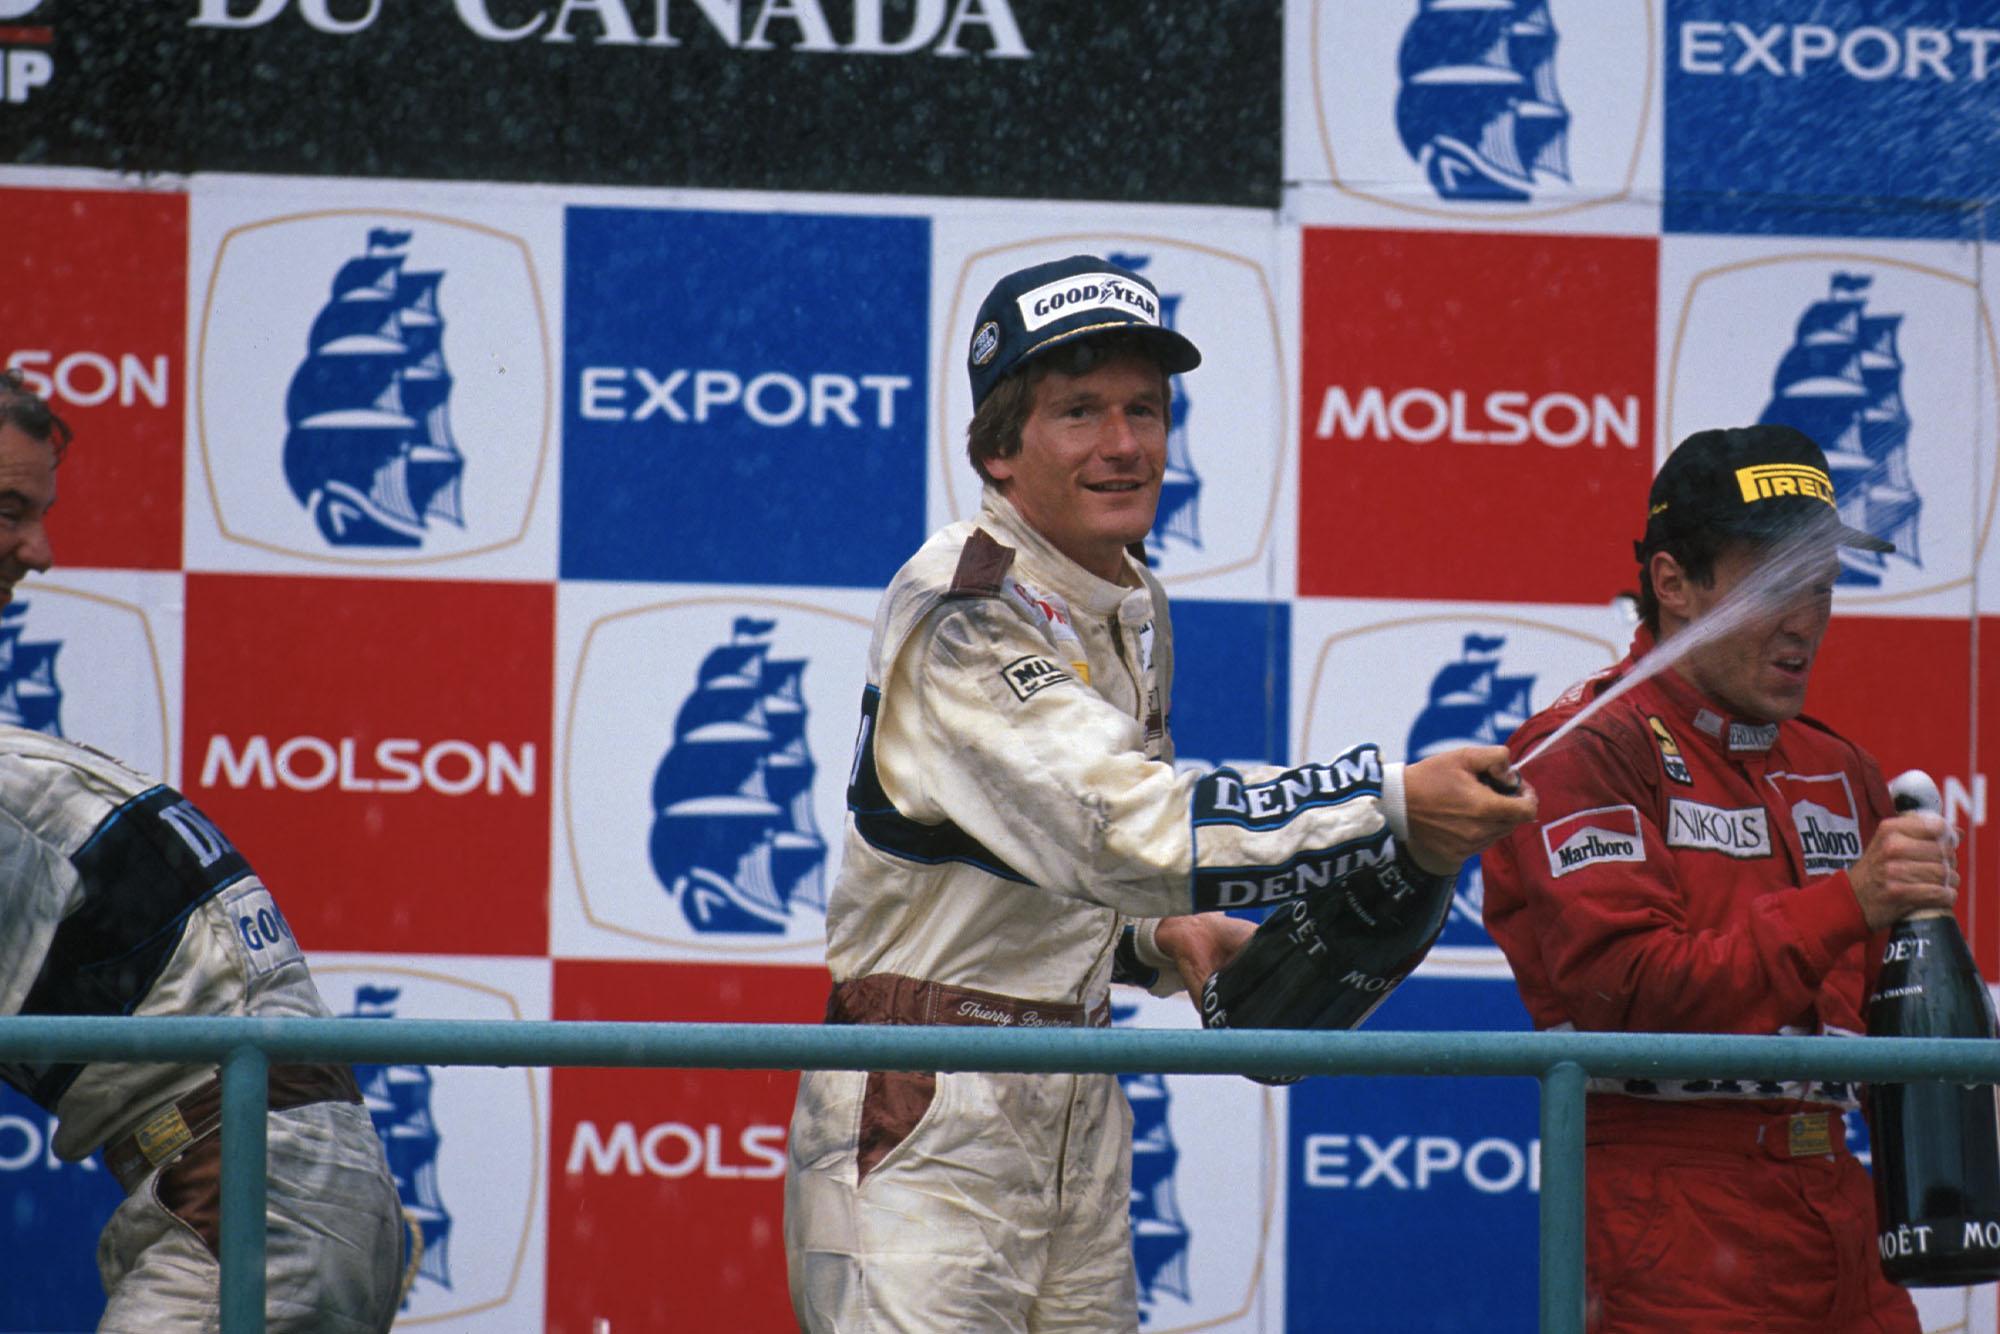 1989 CAN GP podium